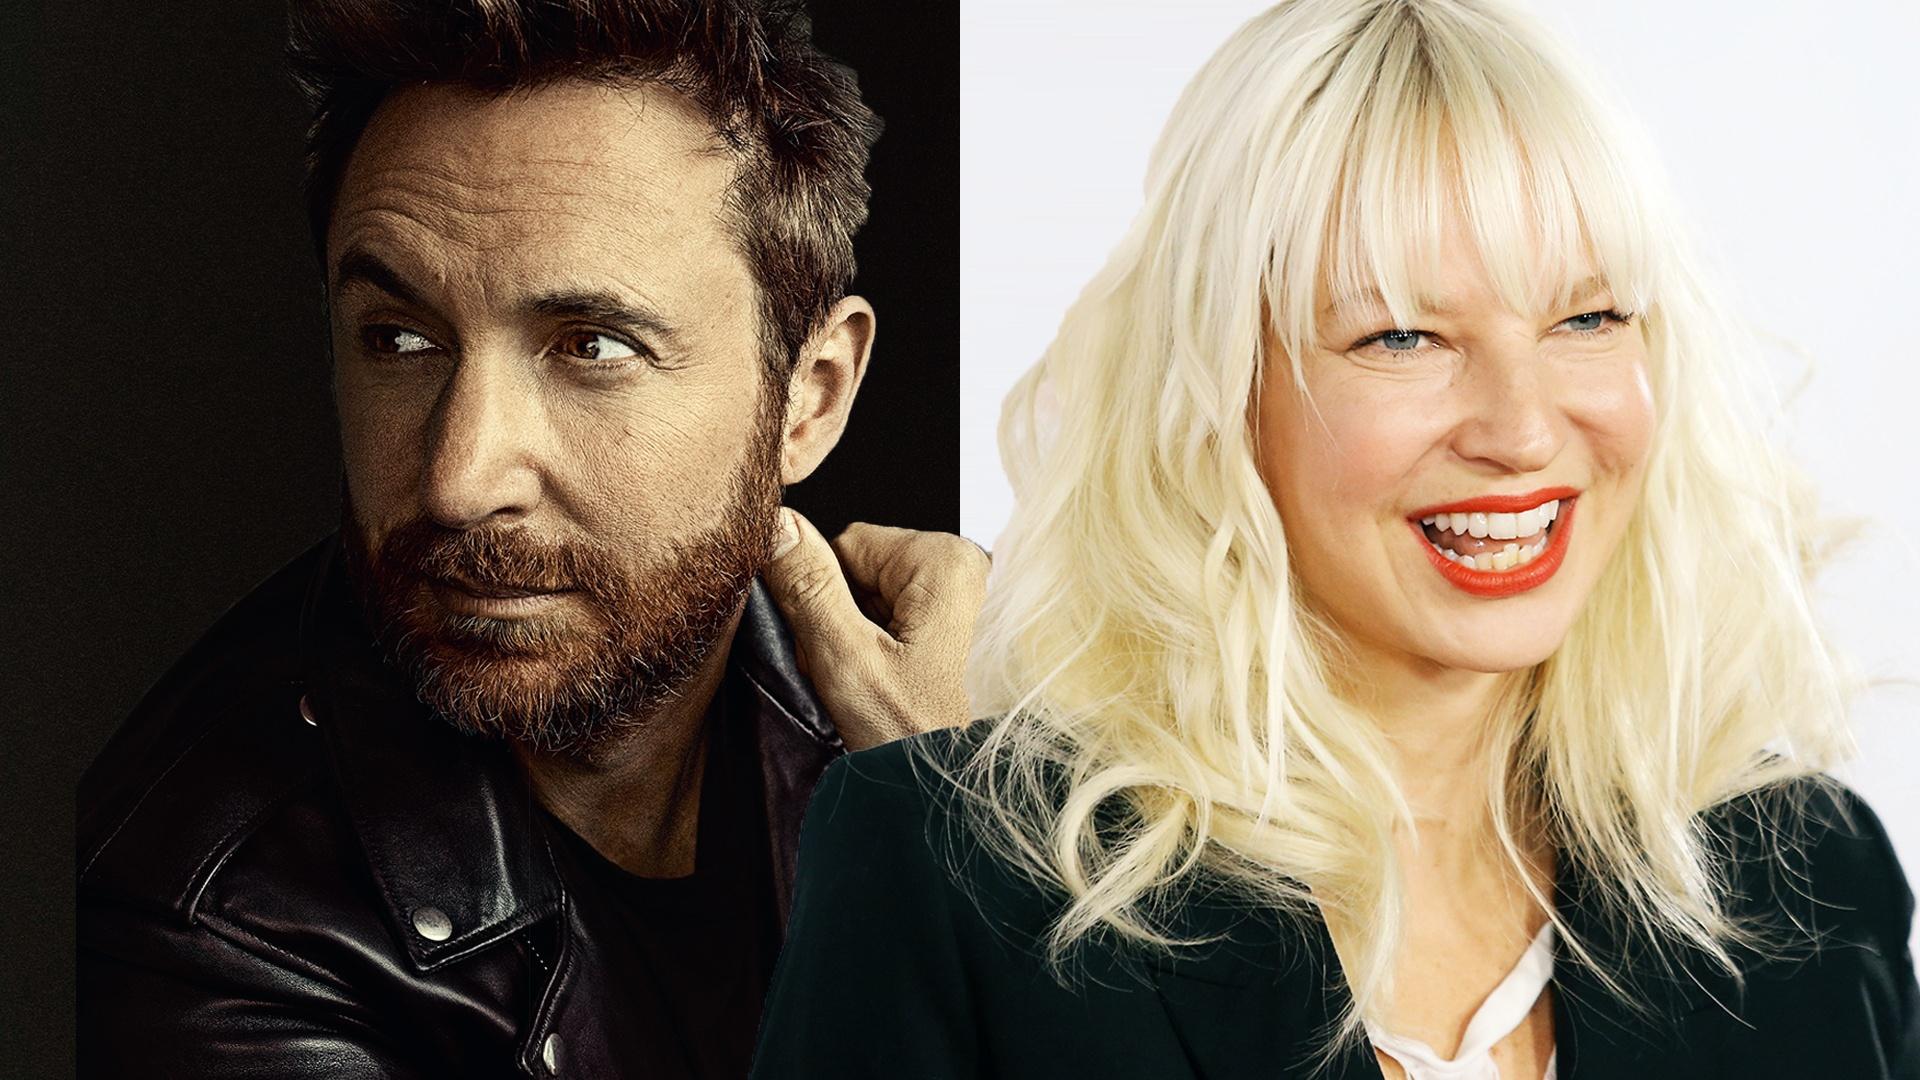 Amamos! David Guetta e Sia se unem de novo no hino poderoso 'Flames'; vem ouvir!